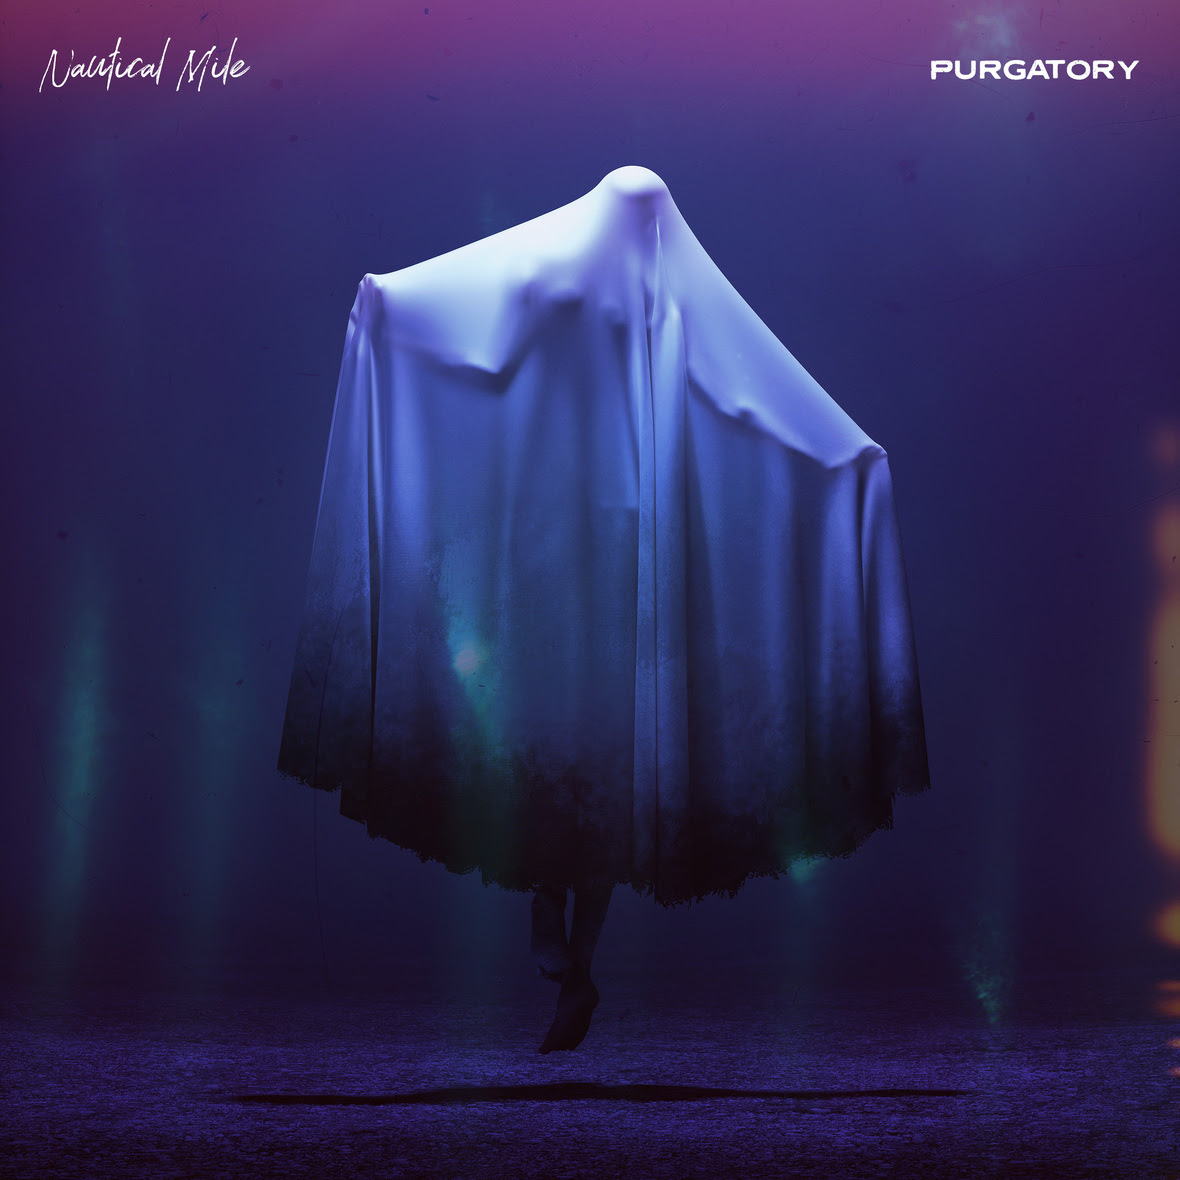 cover art - purgatory